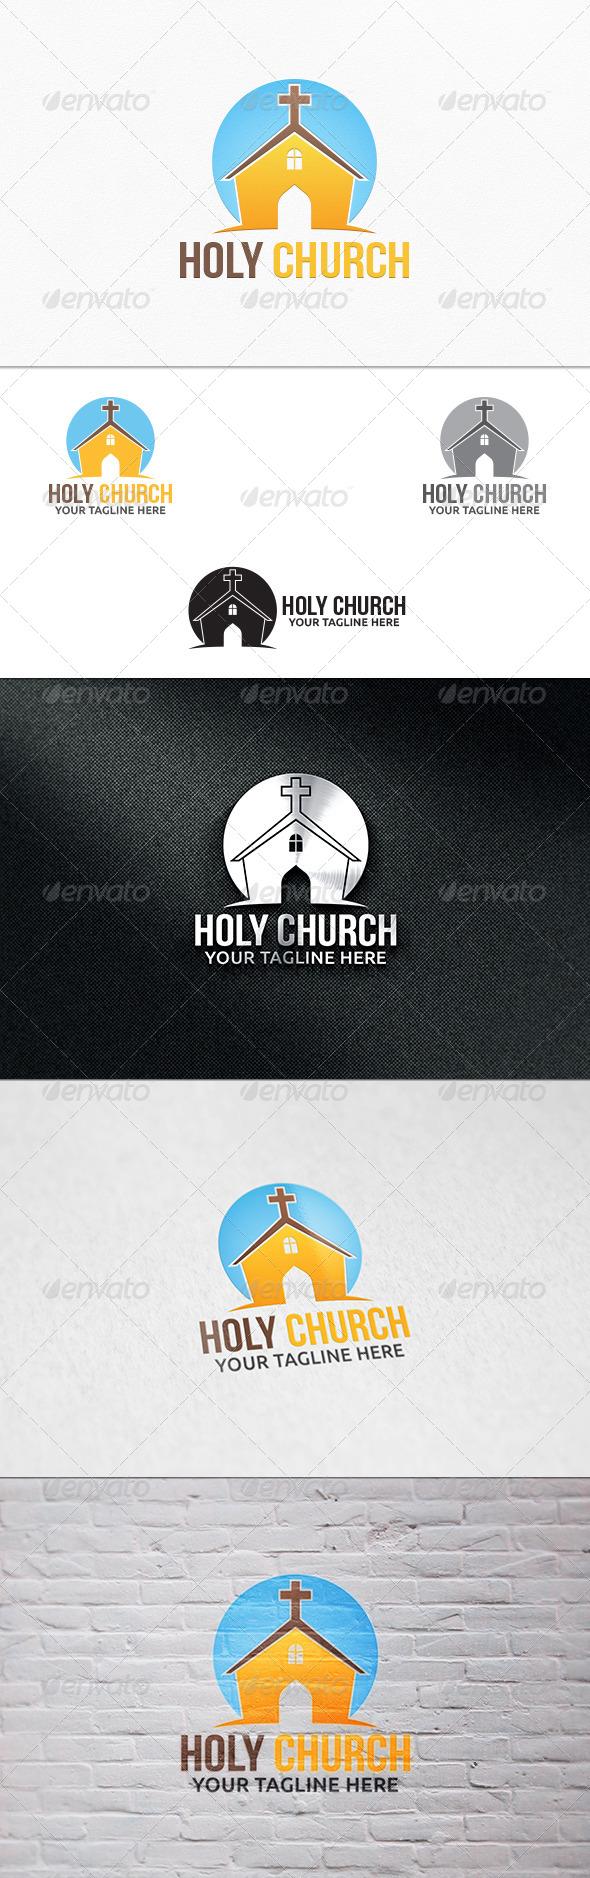 Holy Church - Logo Template - Buildings Logo Templates